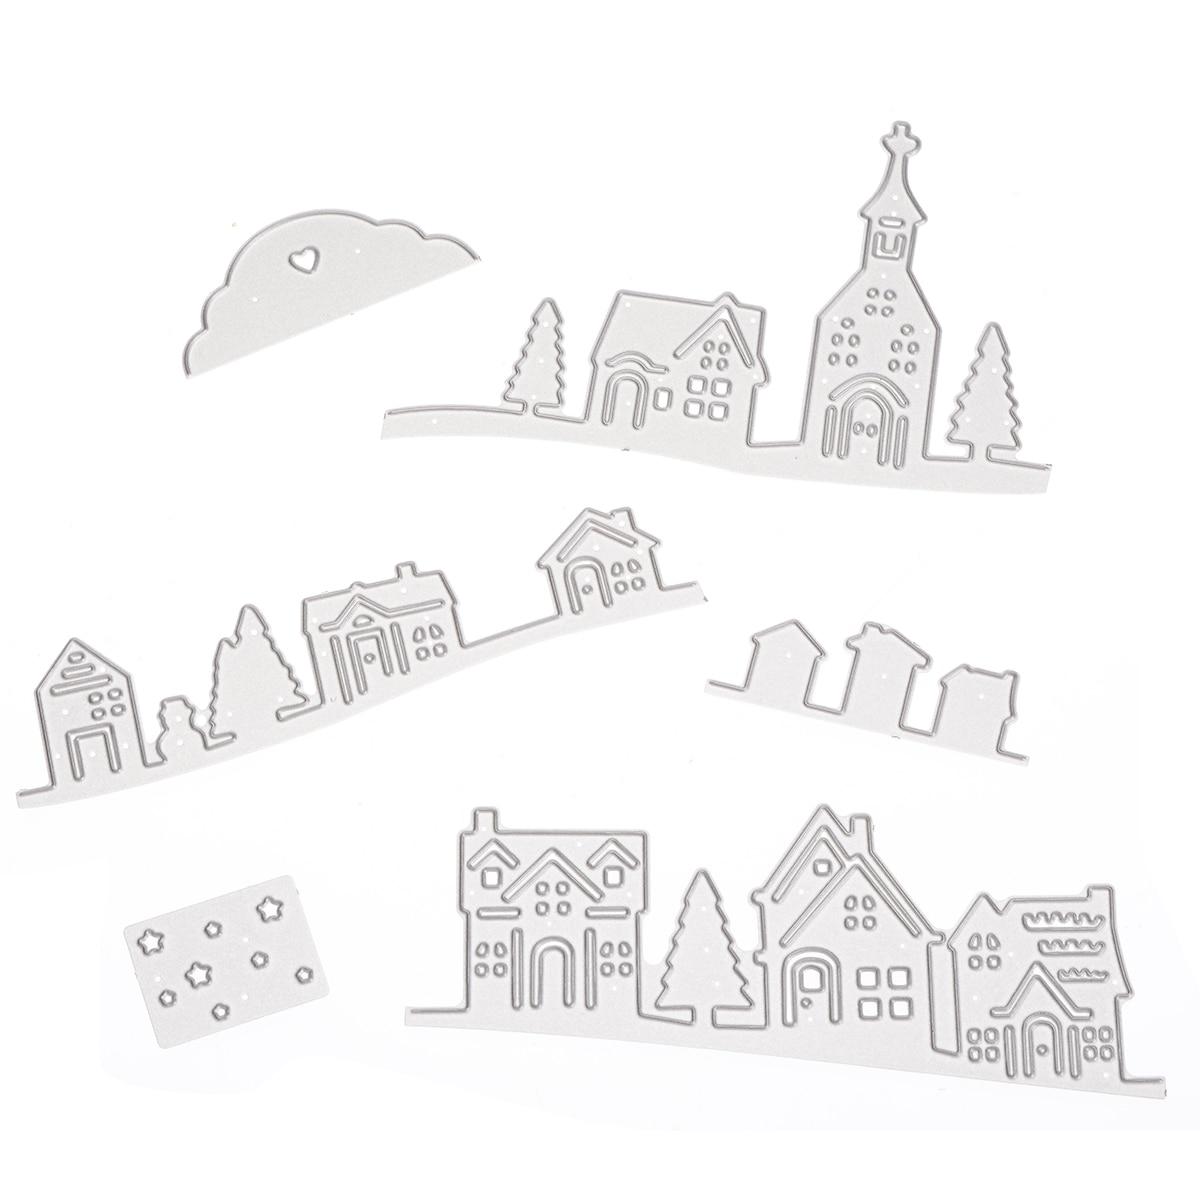 Village church Metal Cutting Dies Stencils For DIY Scrapbooking Paper Card